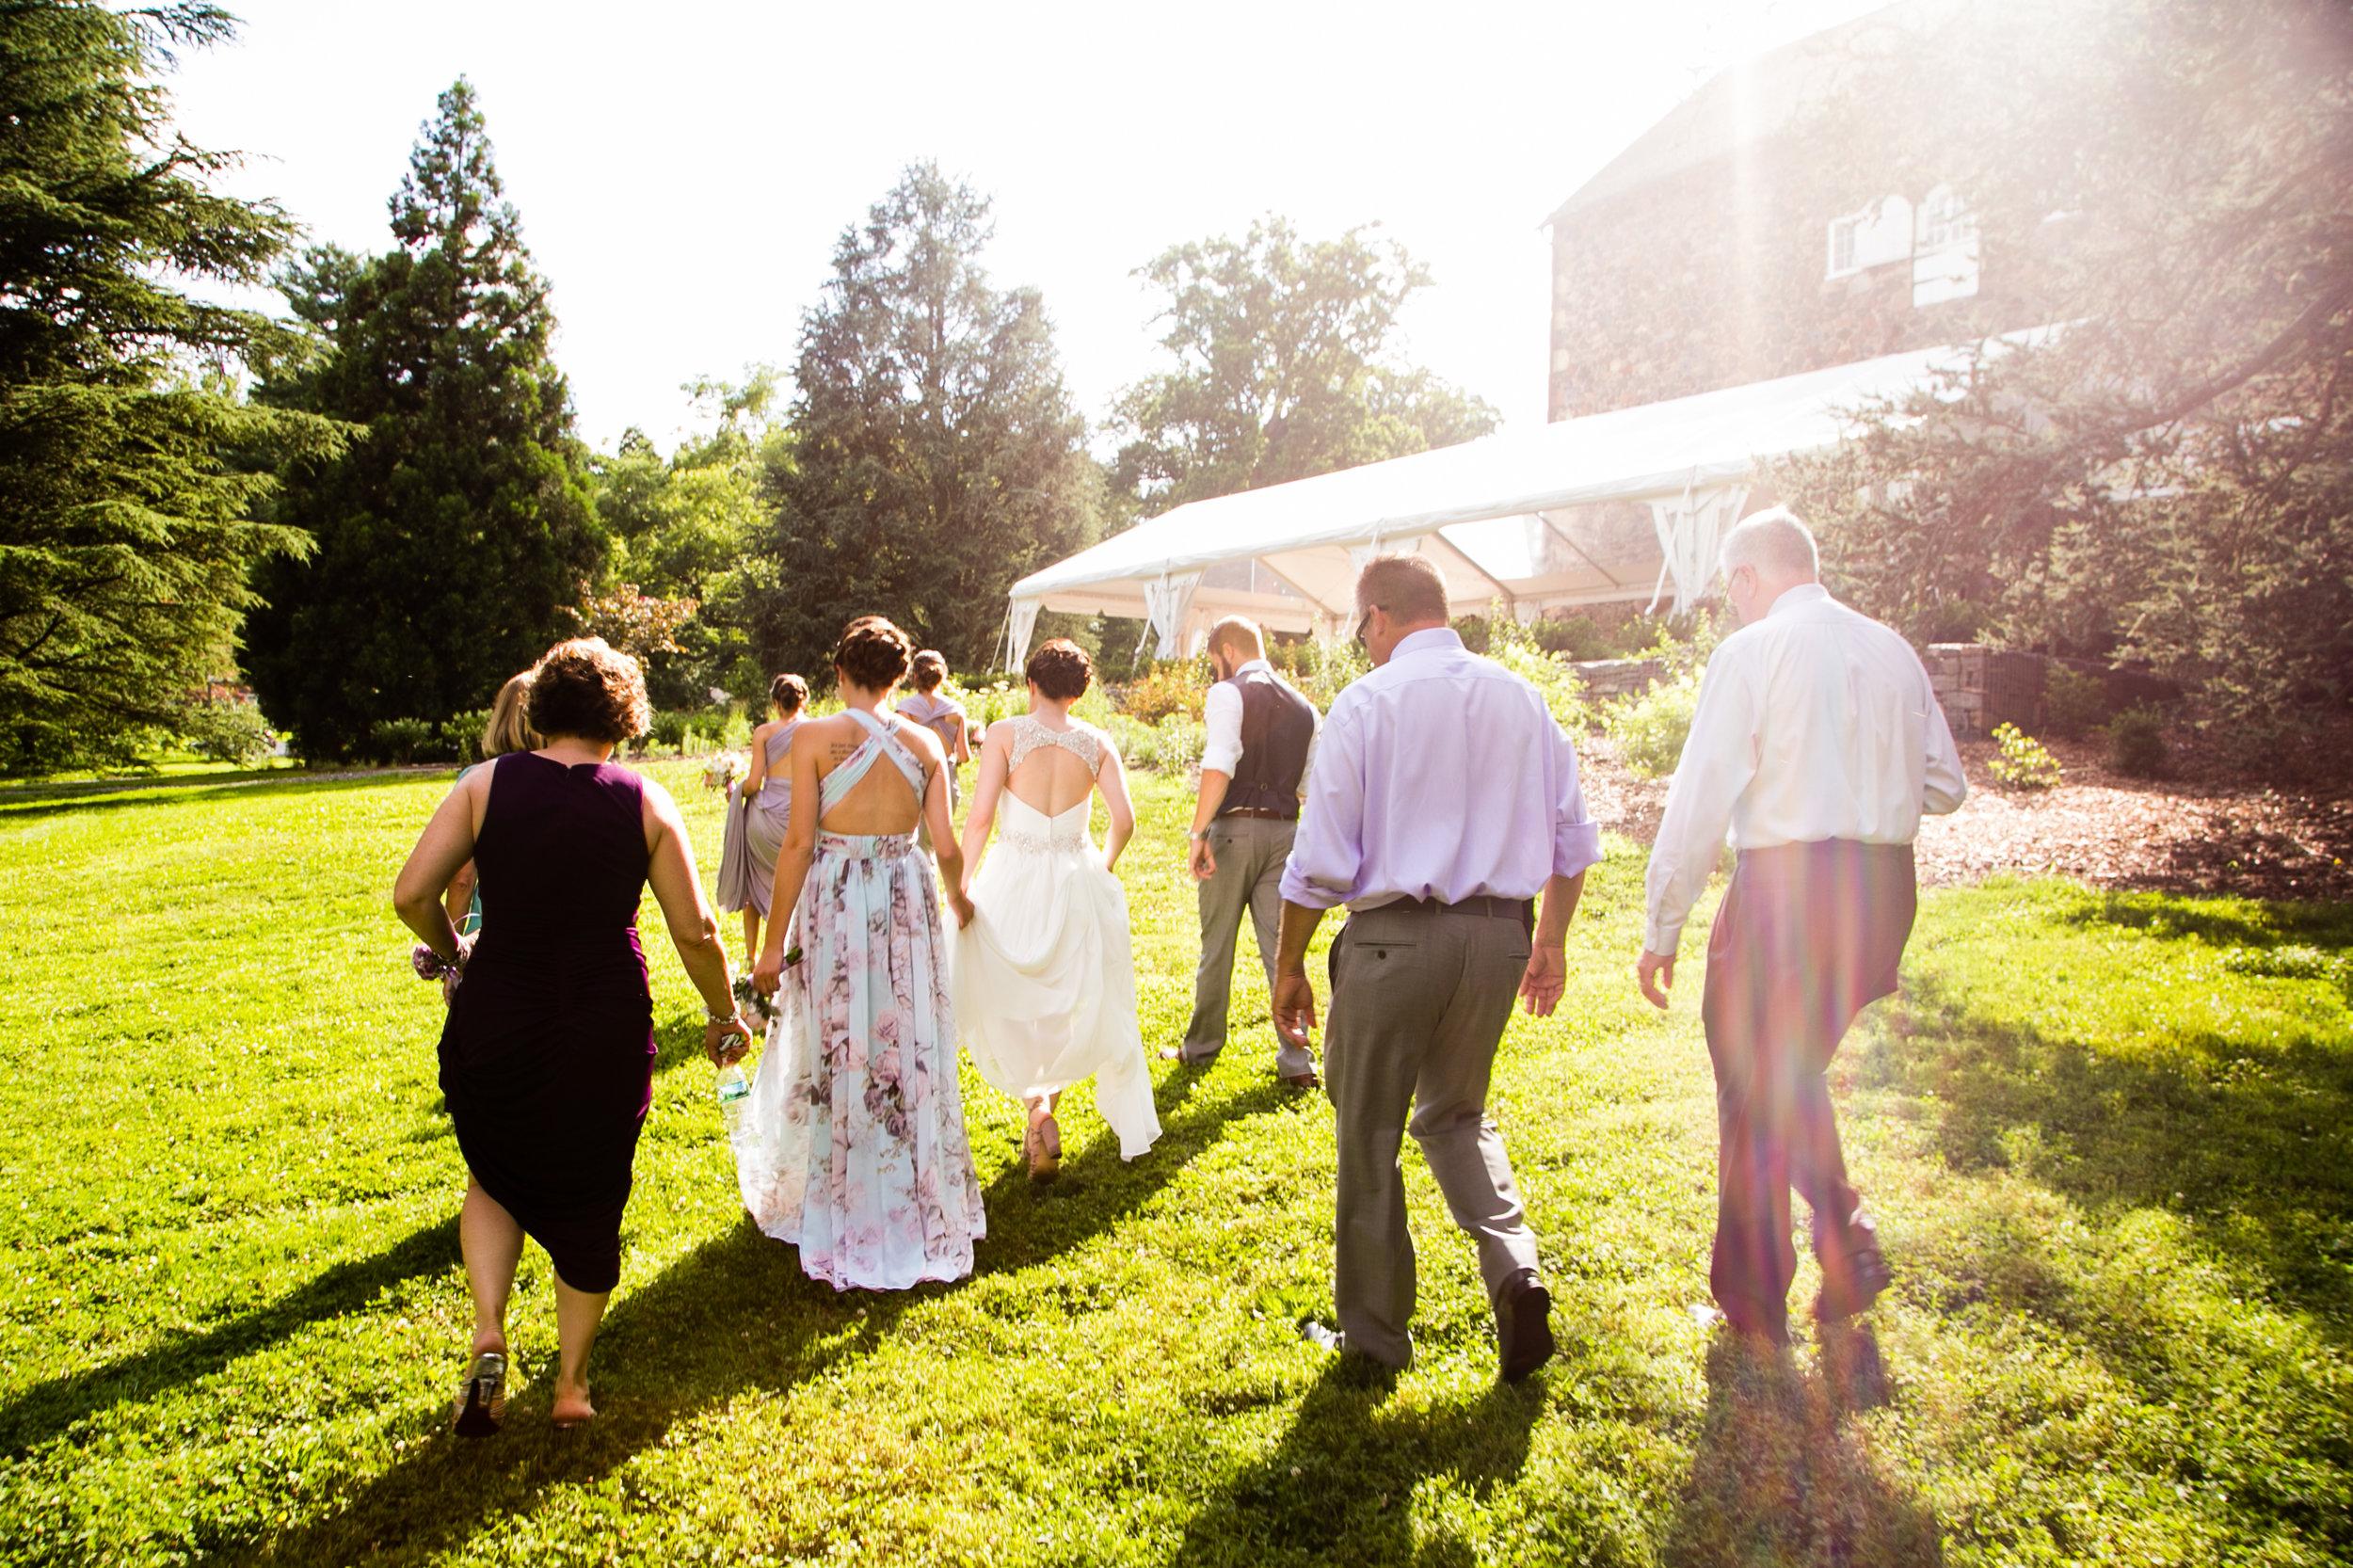 TYLER ARBORETUM WEDDING PHOTOGRAPHY LOVESTRUCK PICTURES-033.jpg